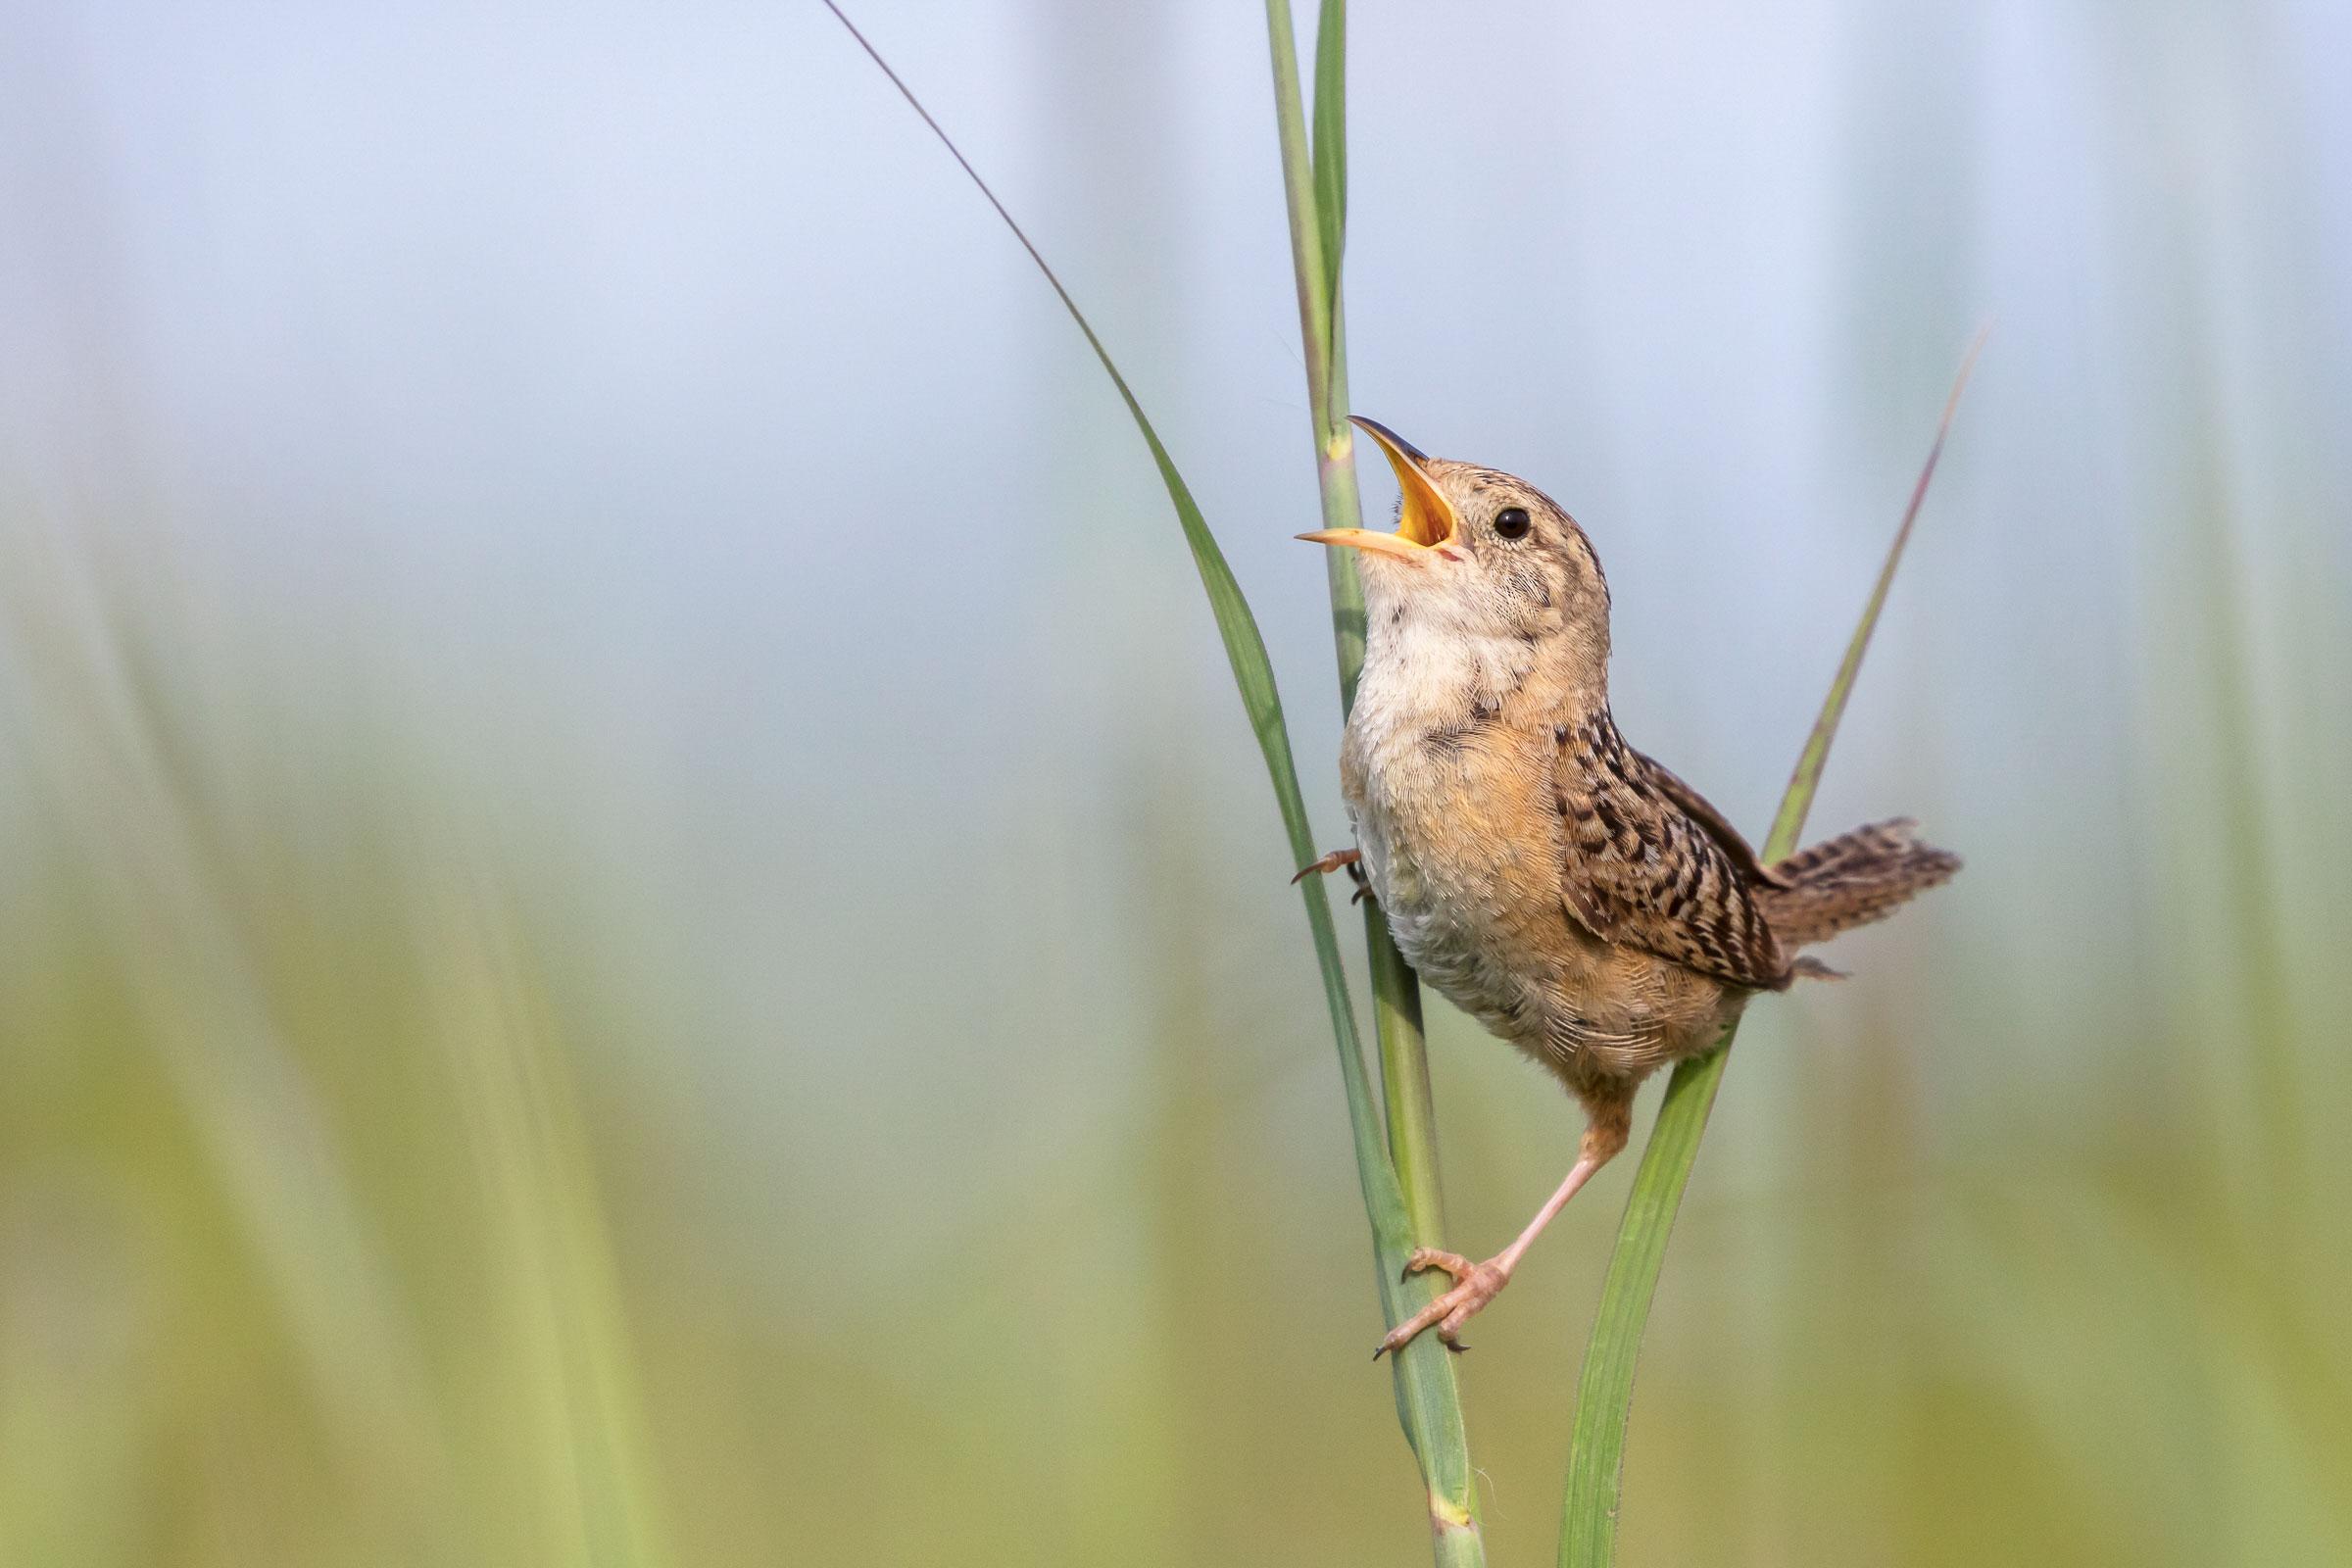 Sedge Wren. Kathryn Cubert/Audubon Photography Awards